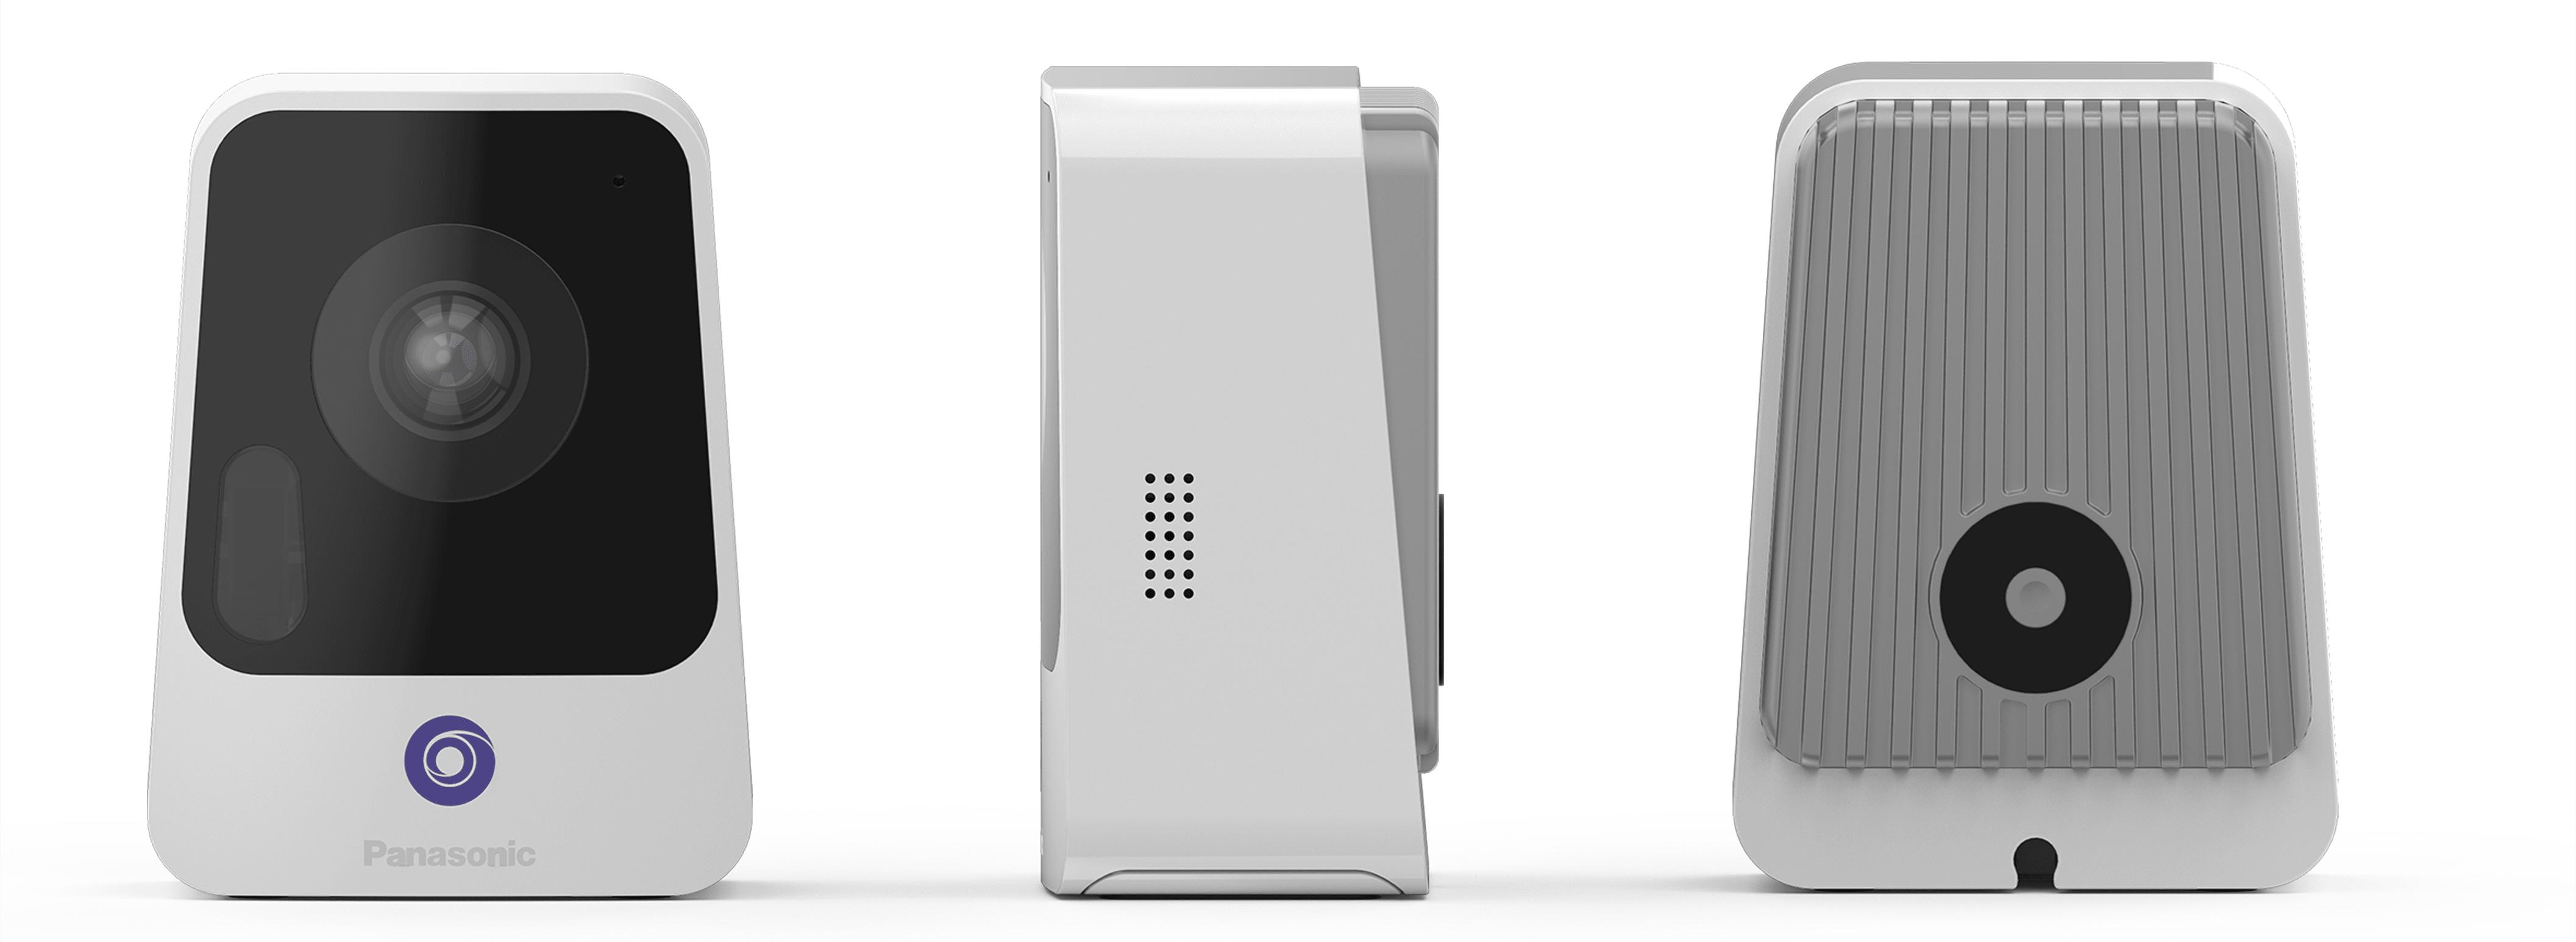 Panasonic nubo 4g security camera slimdesign smart product front right back views